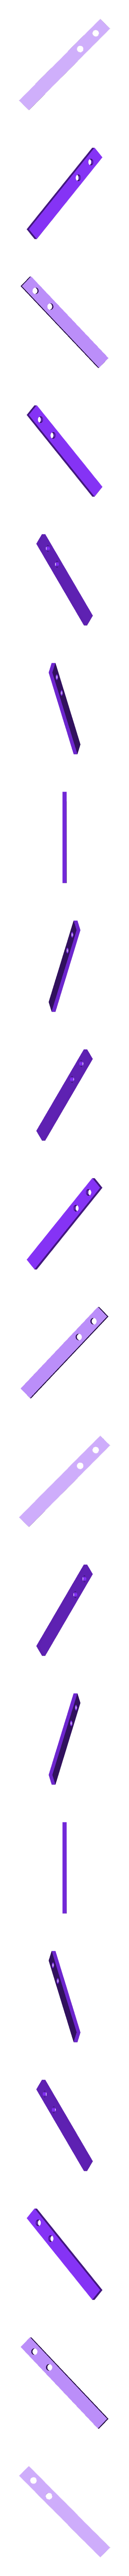 short_leg_2.stl Download free STL file Firestorm Quantum Splicer • 3D printable design, poblocki1982